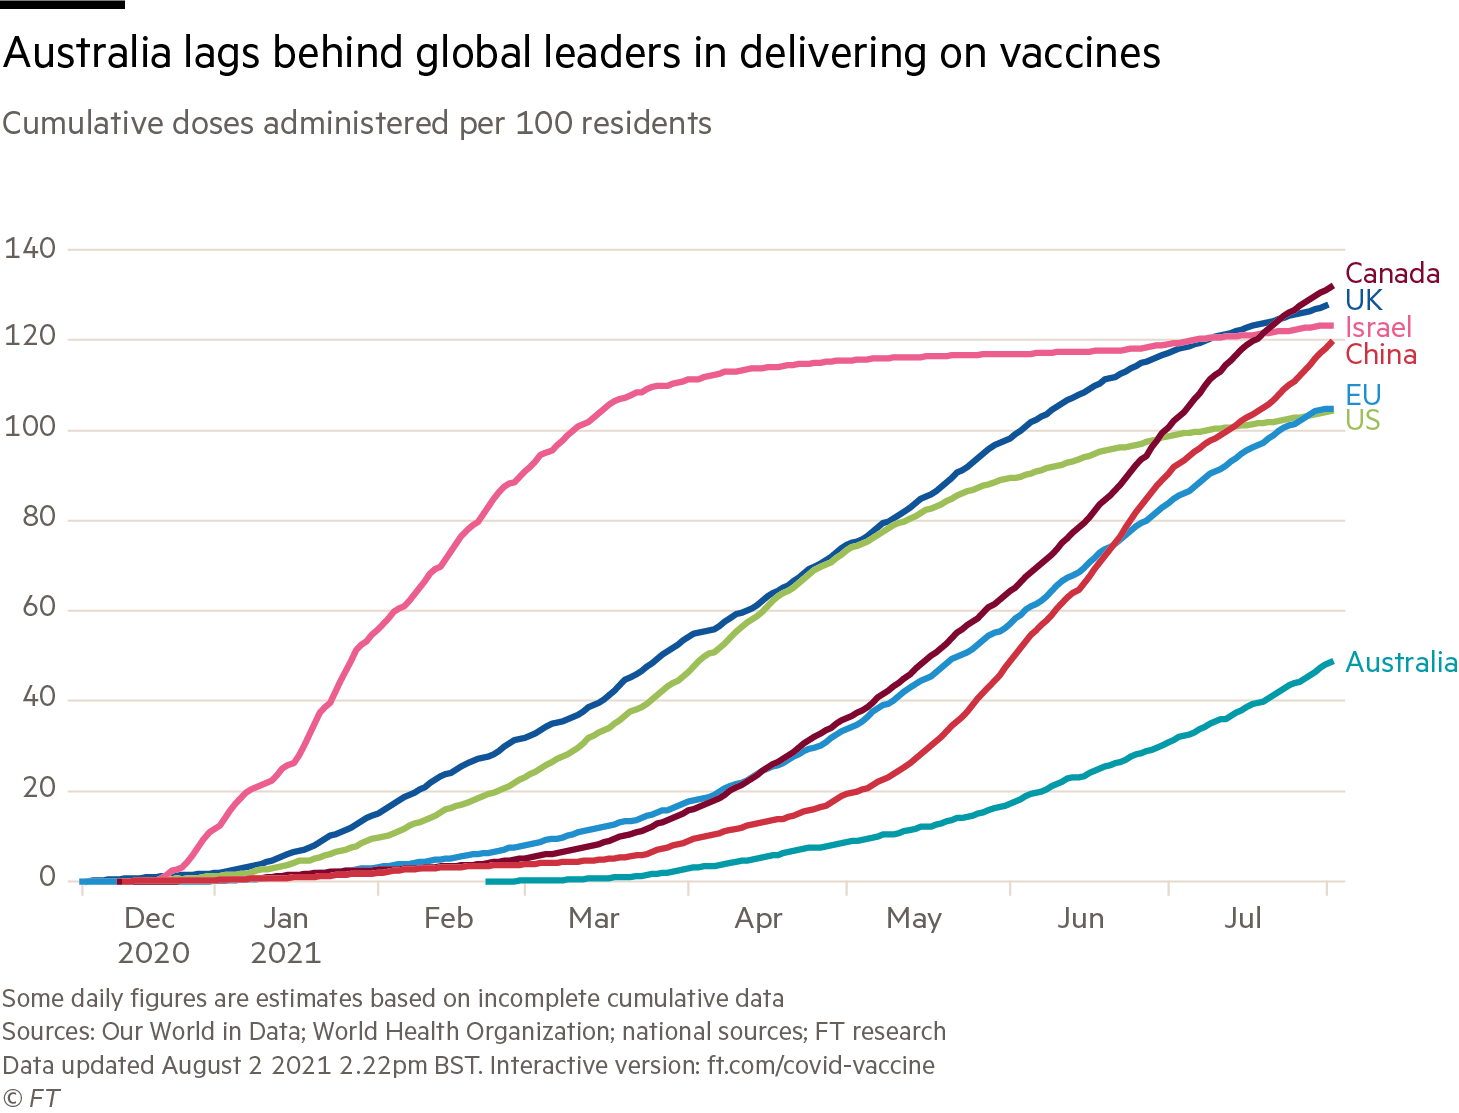 Australia lags behind global leaders in delivering on vaccines